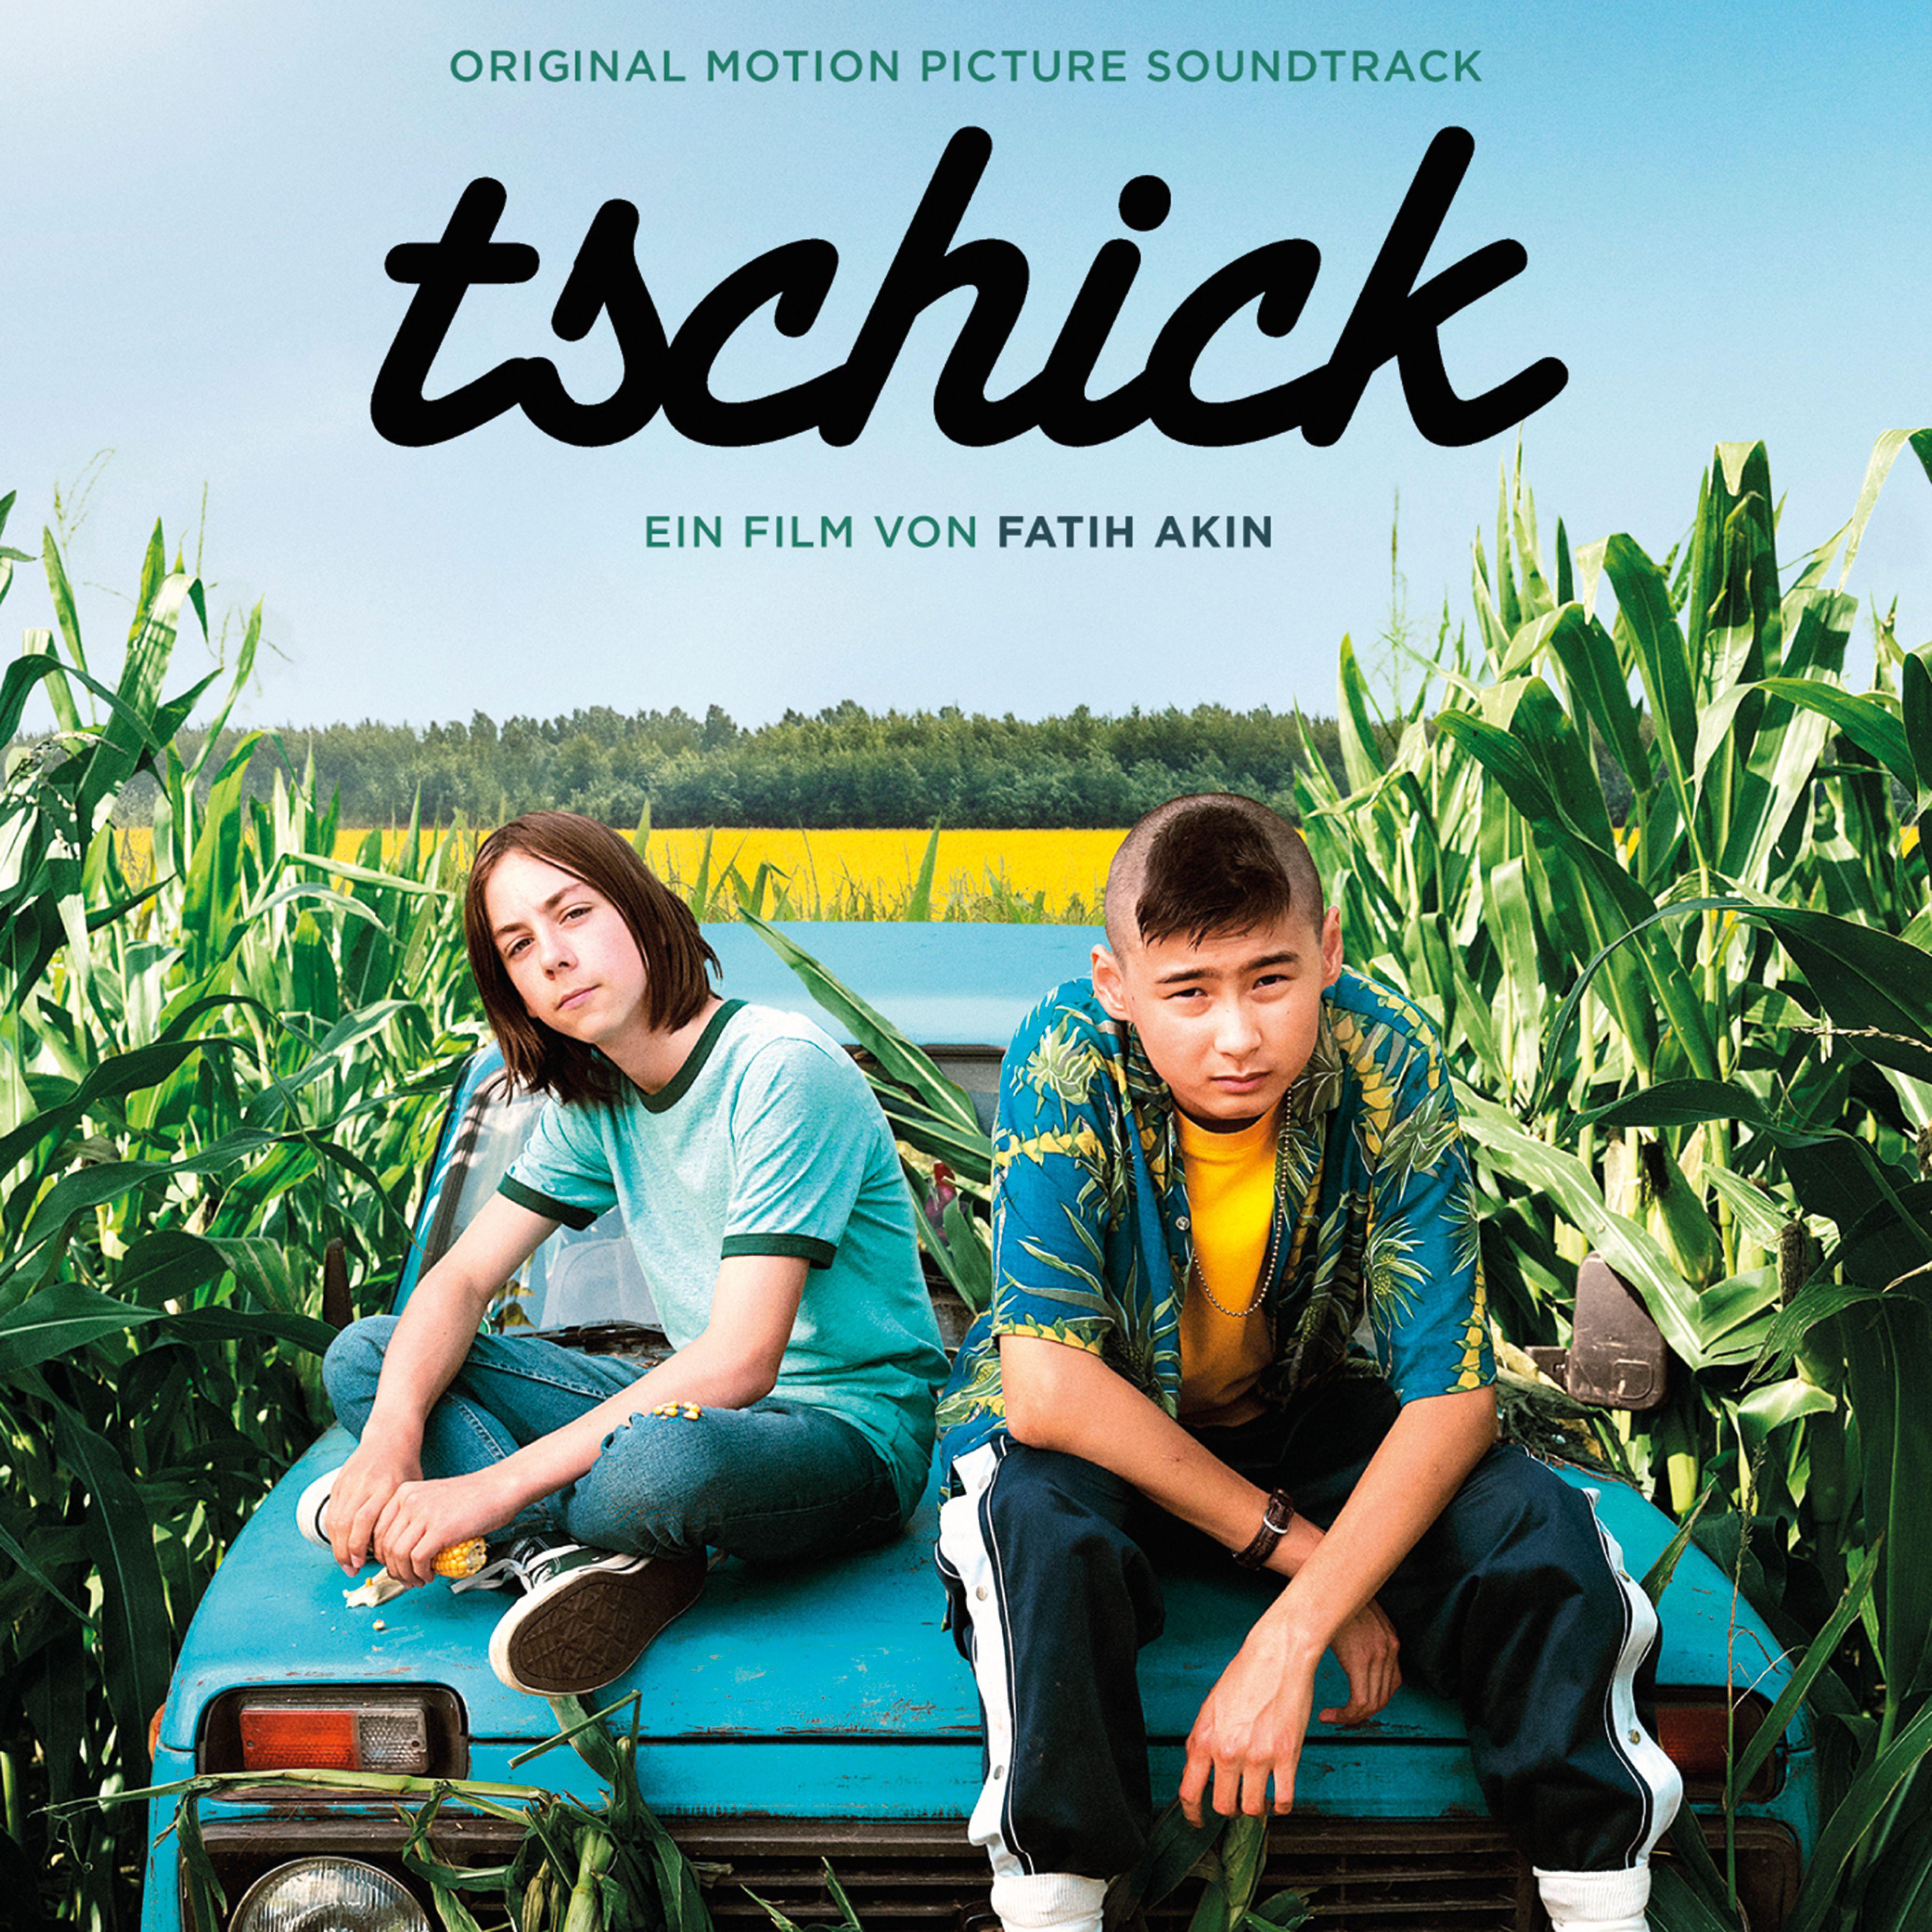 Download Film Tschick 2016